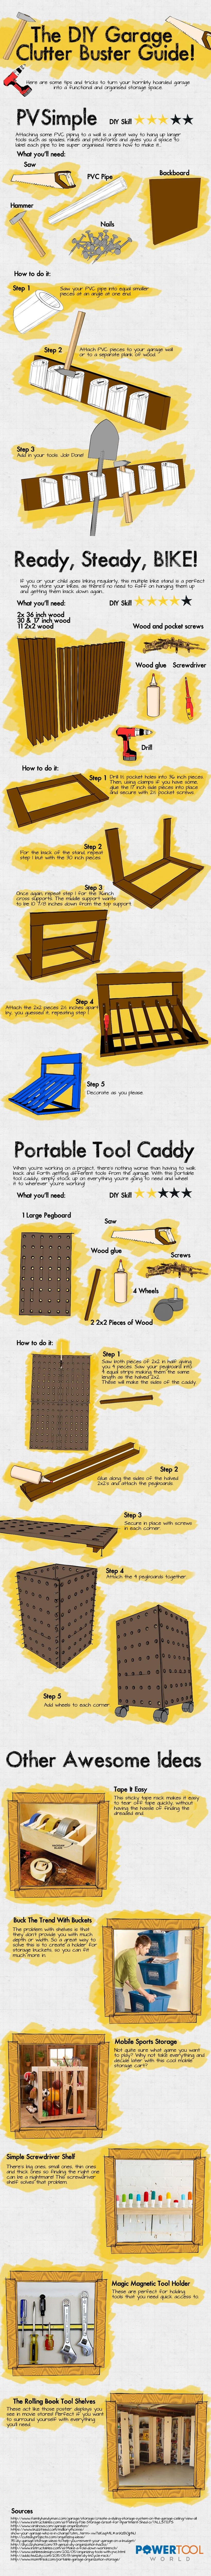 Garage organization / decluttering - infographic DIY guide